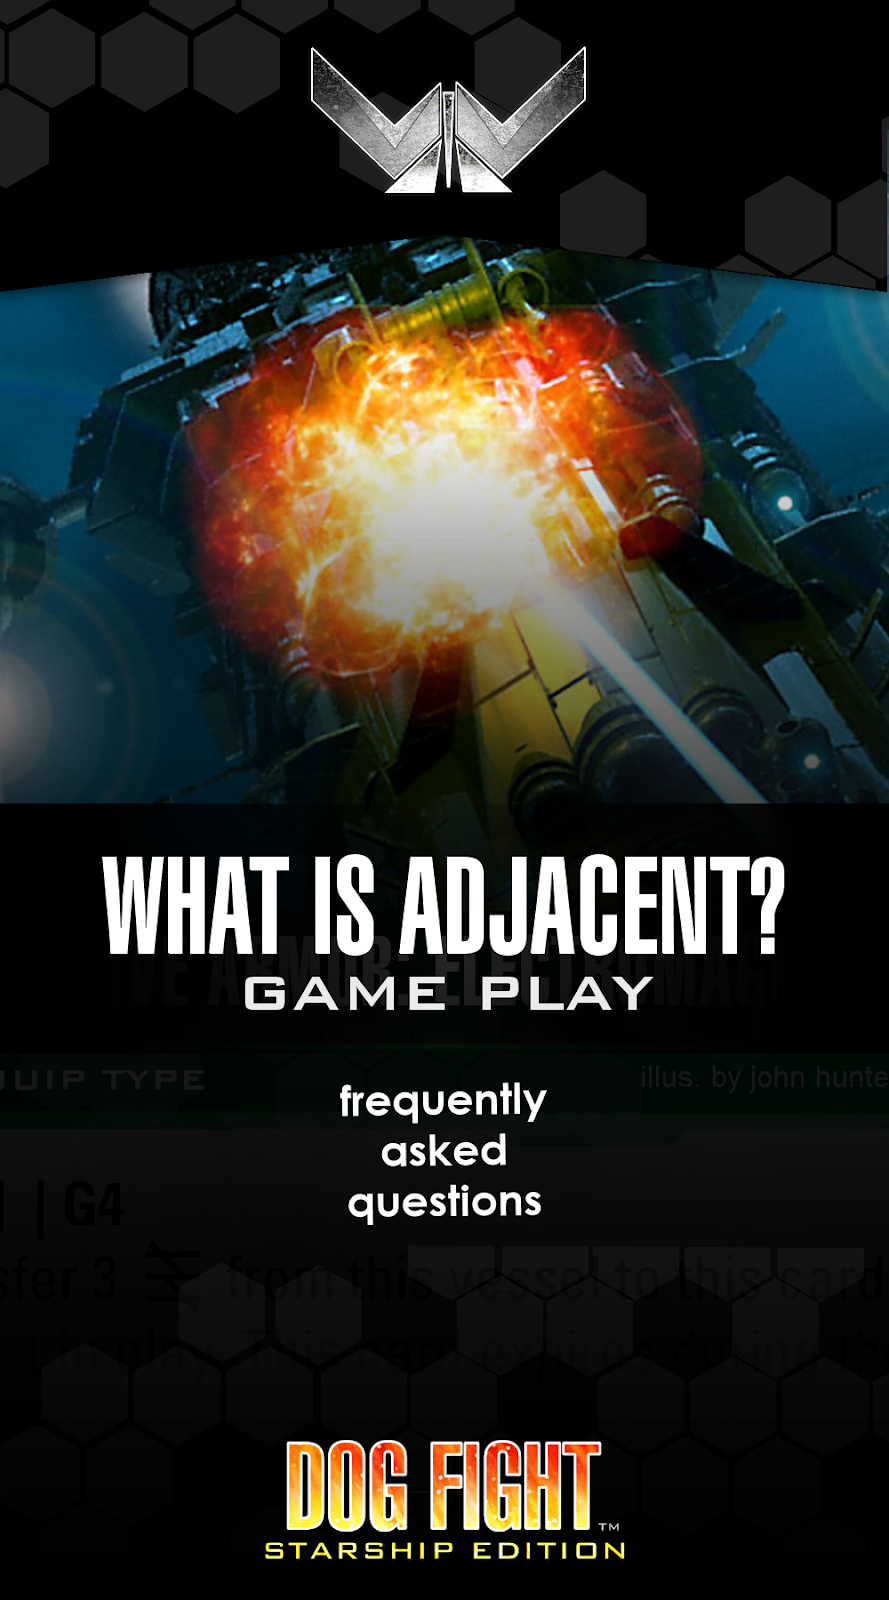 Dog Fight: Starship Edition FAQ what is adjacent